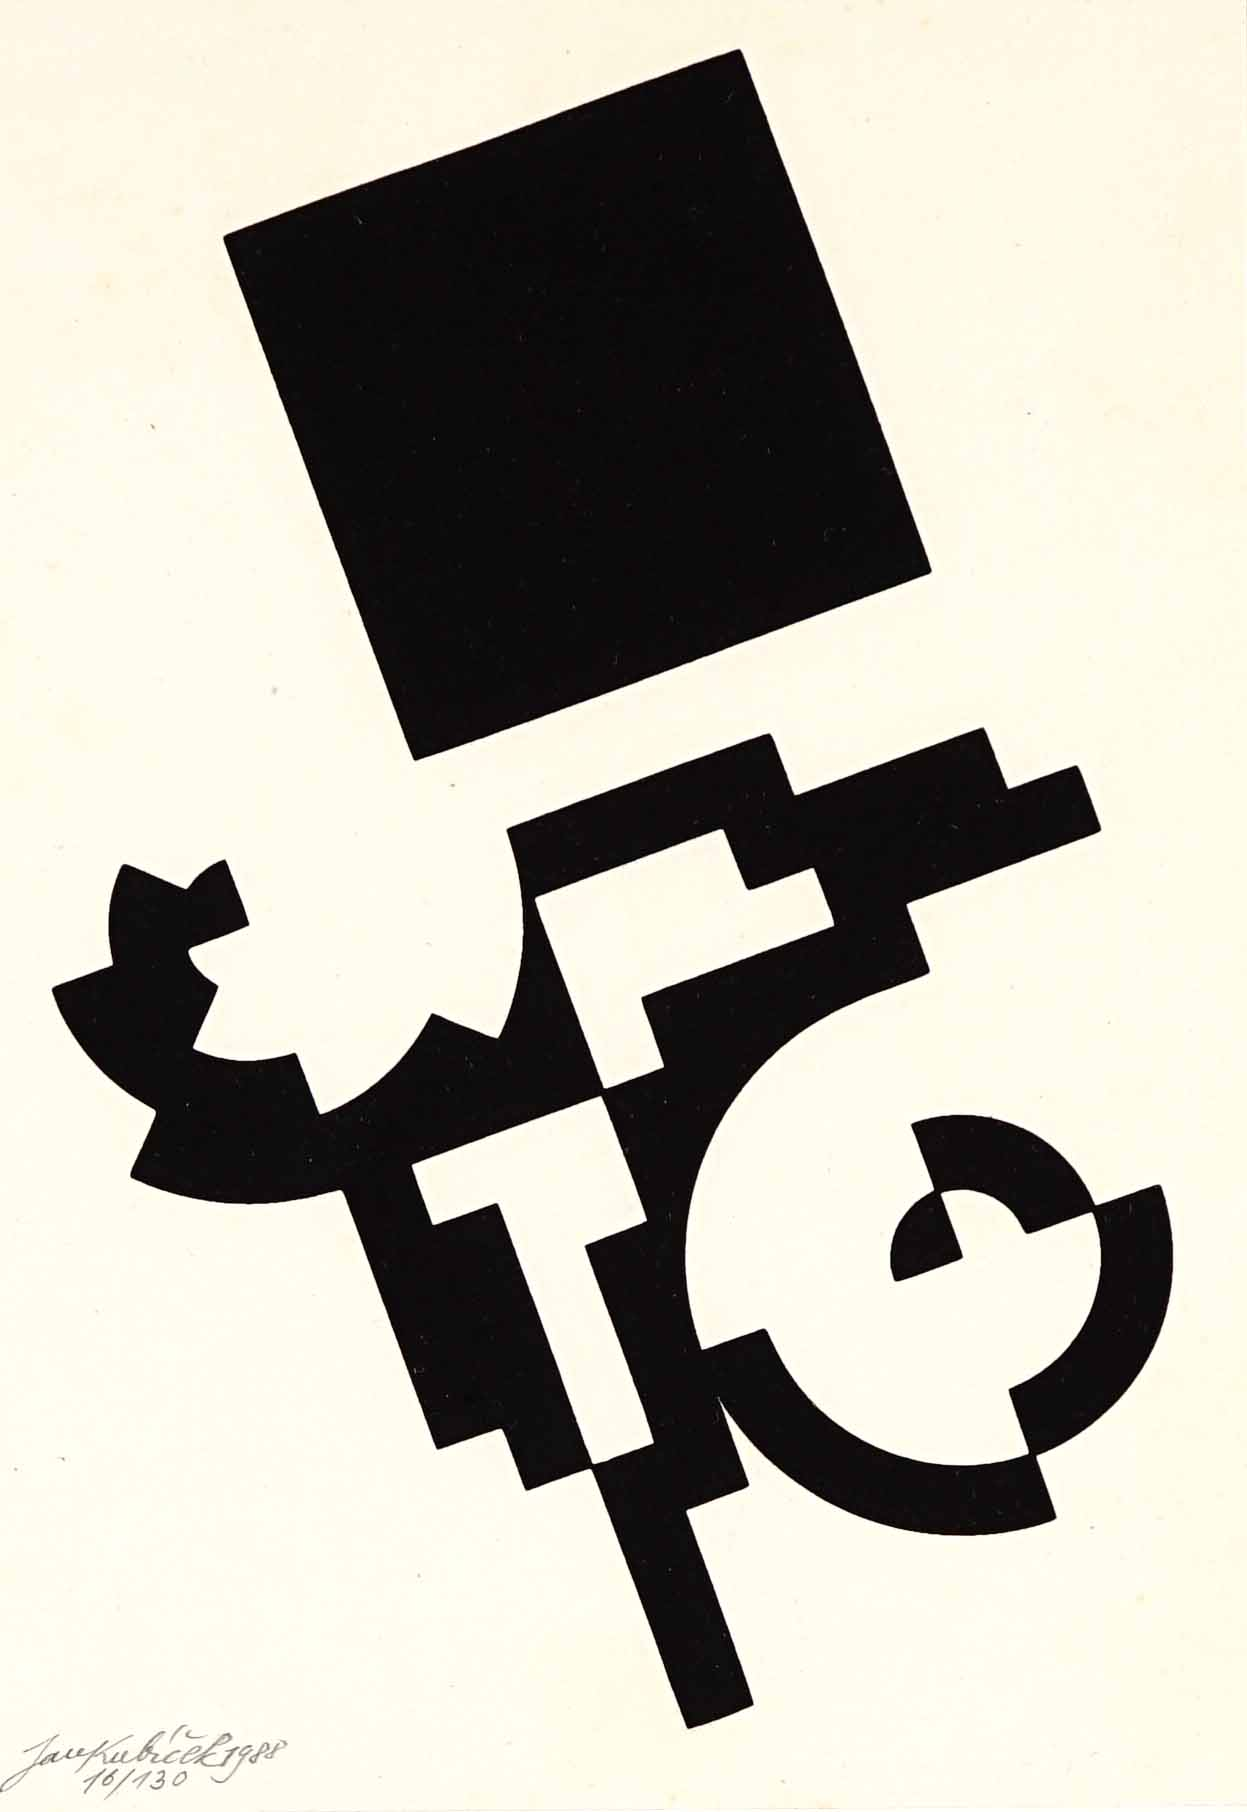 Bez tytułu, 1988